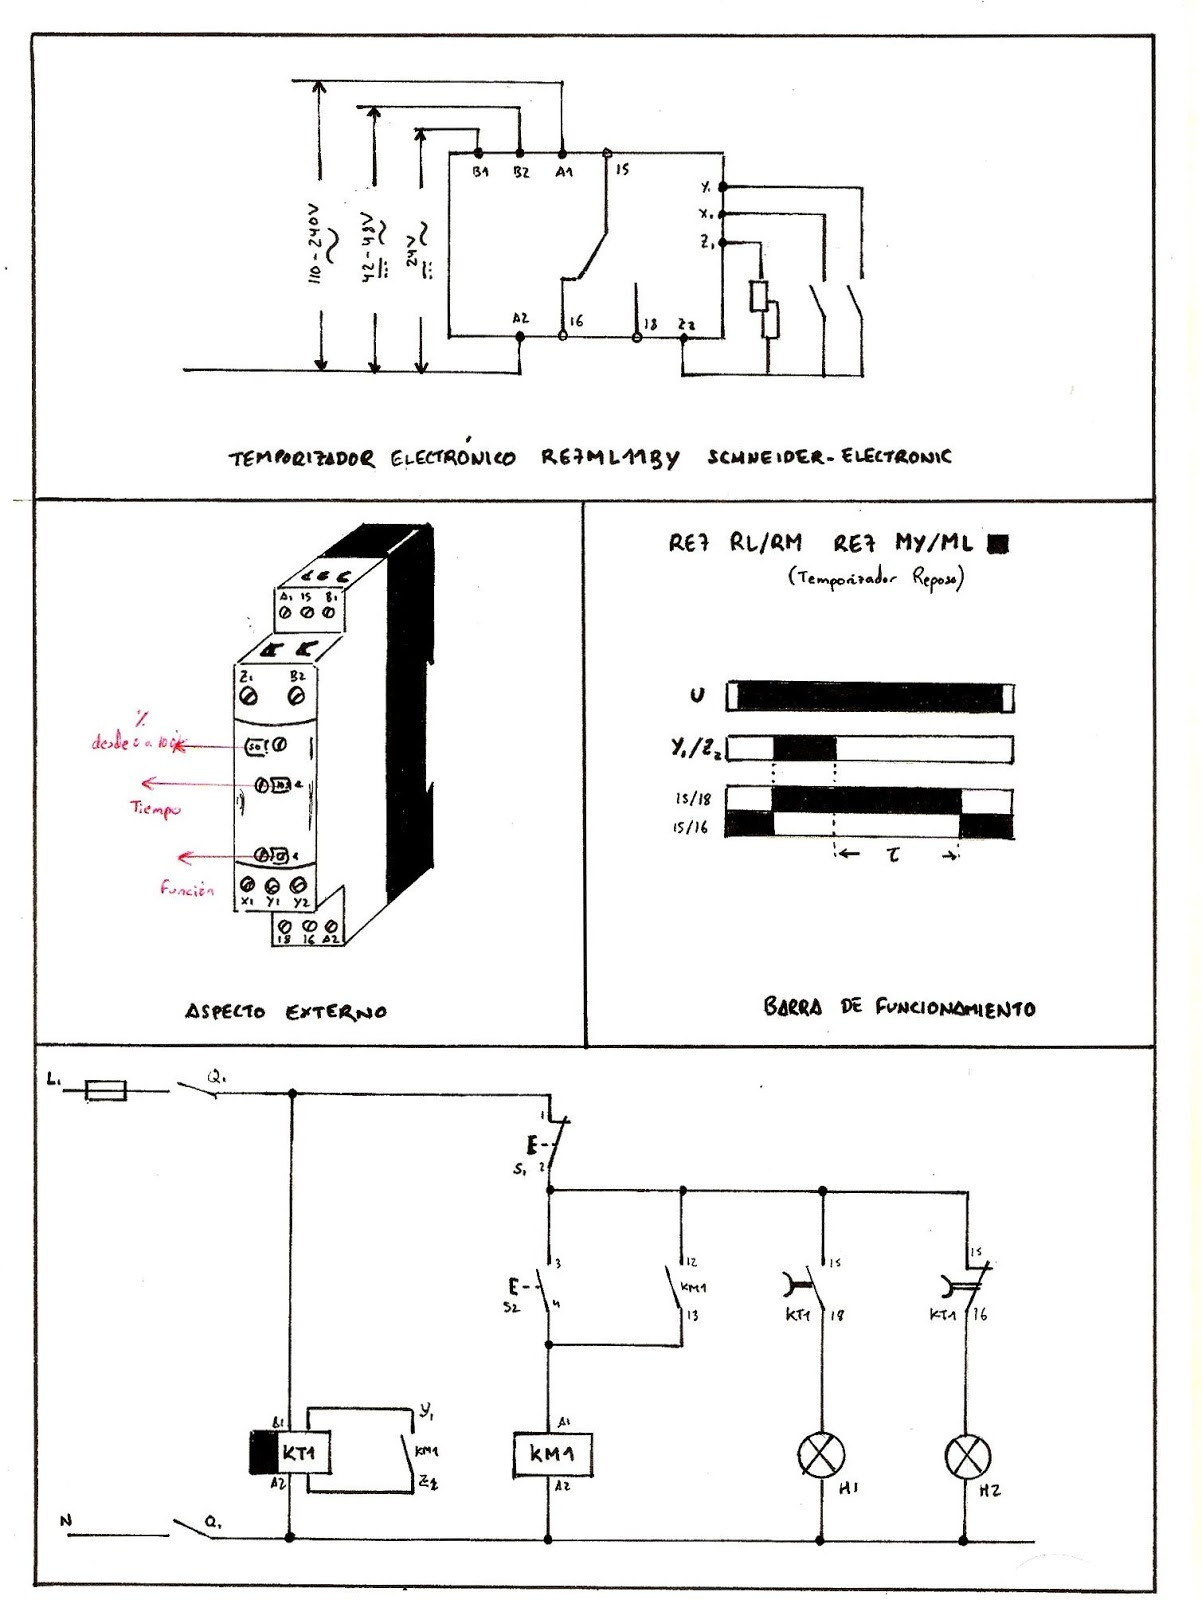 Pr ctica 4 0 temporizador electr nico al reposo - Temporizadores de luz ...